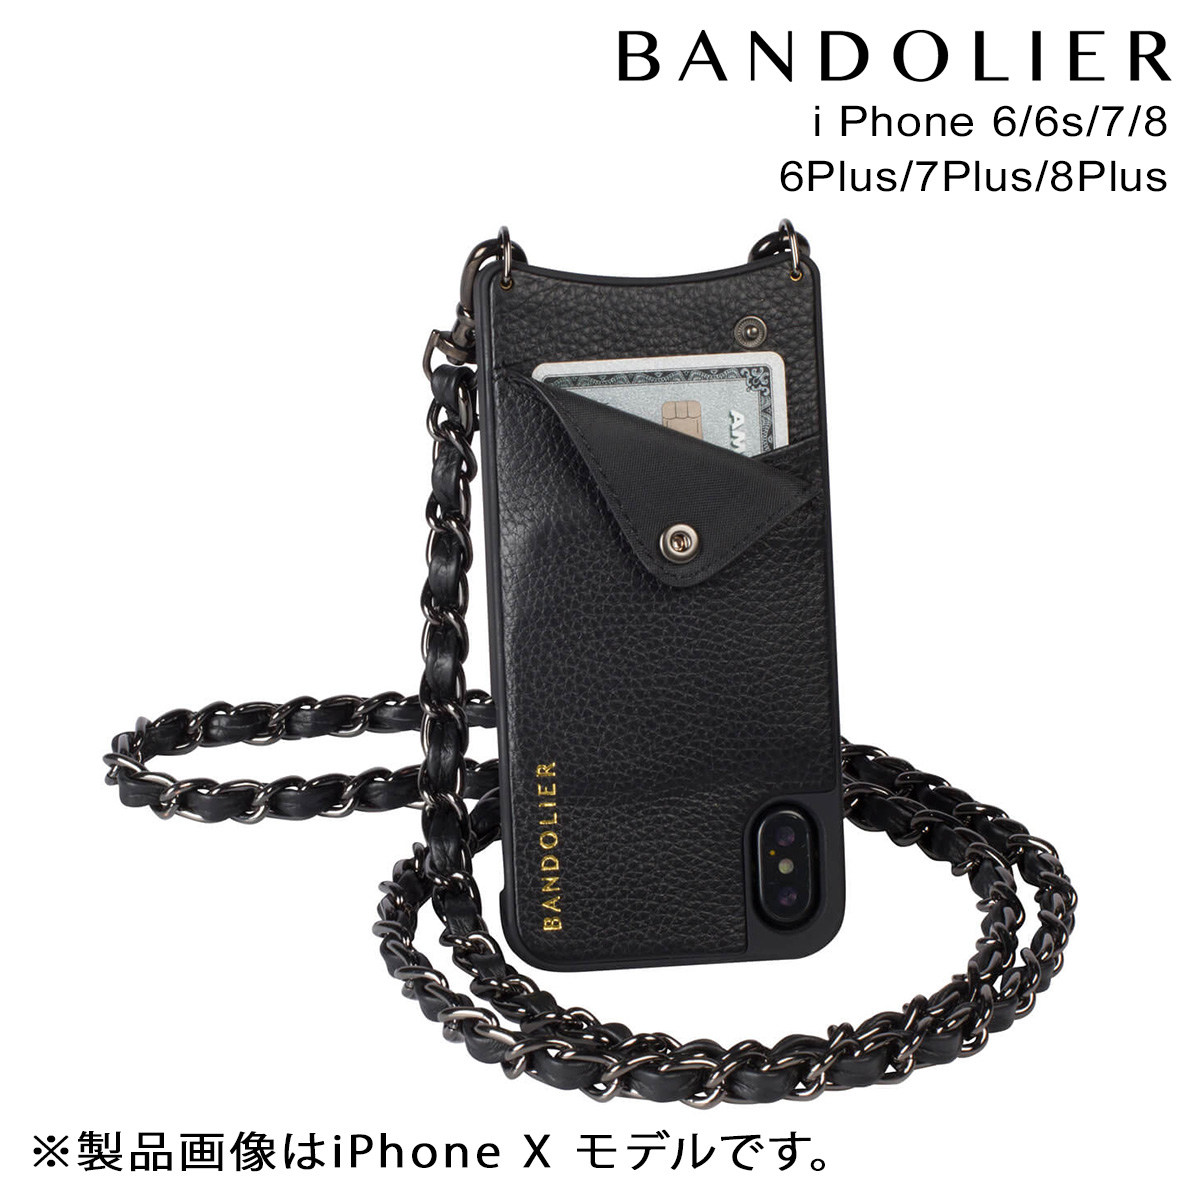 BANDOLIER iPhone8 iPhone7 7Plus 6s LUCY PEWTER バンドリヤー ケース スマホ アイフォン プラス メンズ レディース